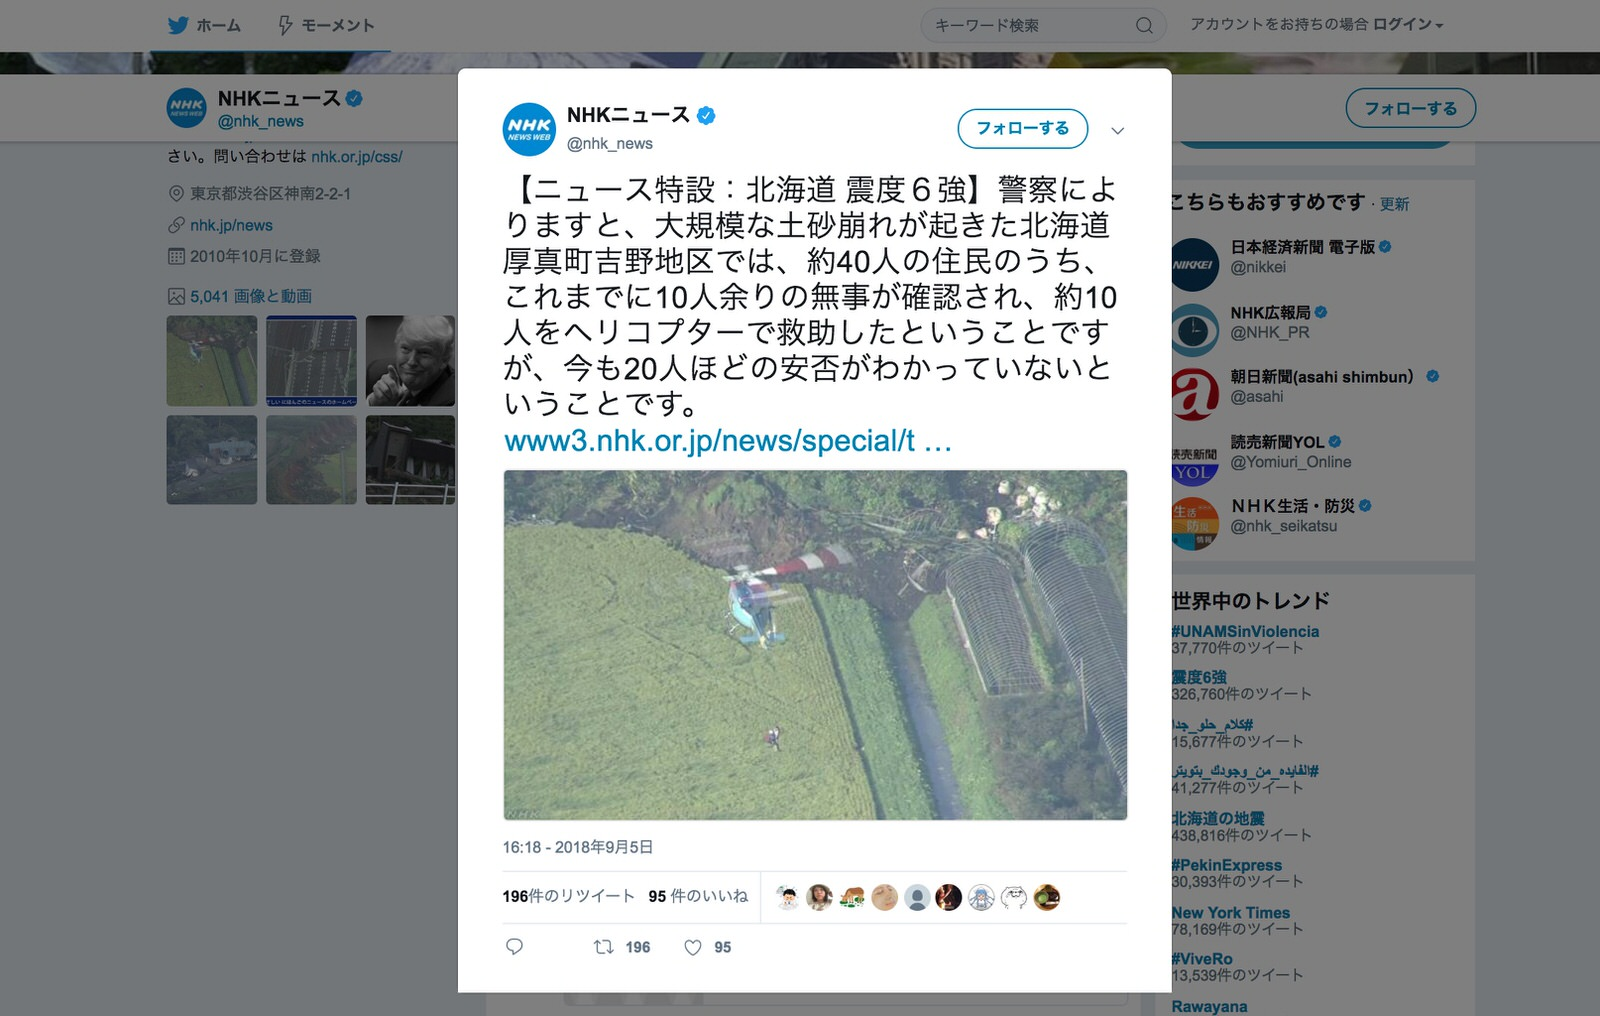 【画像&動画】北海道で震度6強の地震、被害状況の報告多数